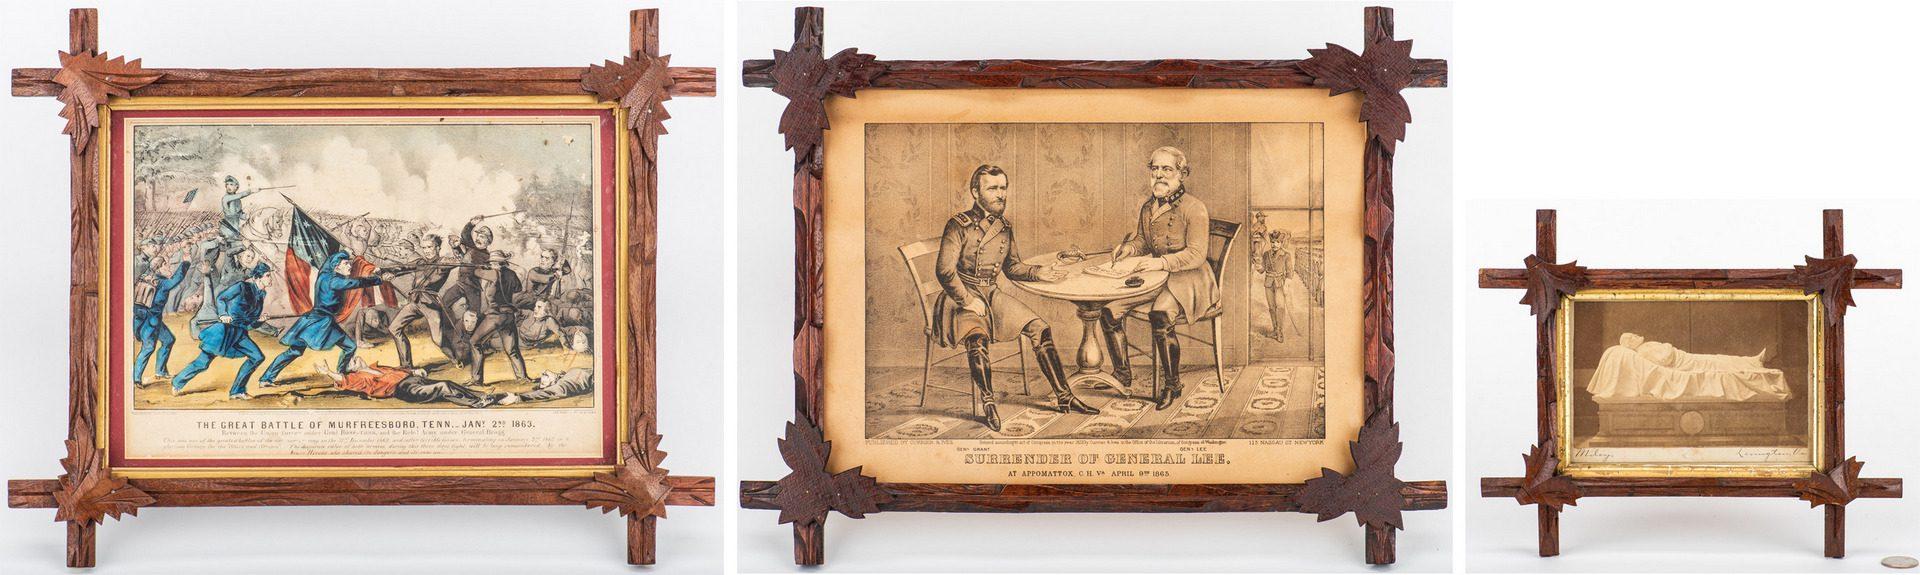 Lot 534: 3 Civil War Framed Items inc. Miley CDV, Currier & Ives